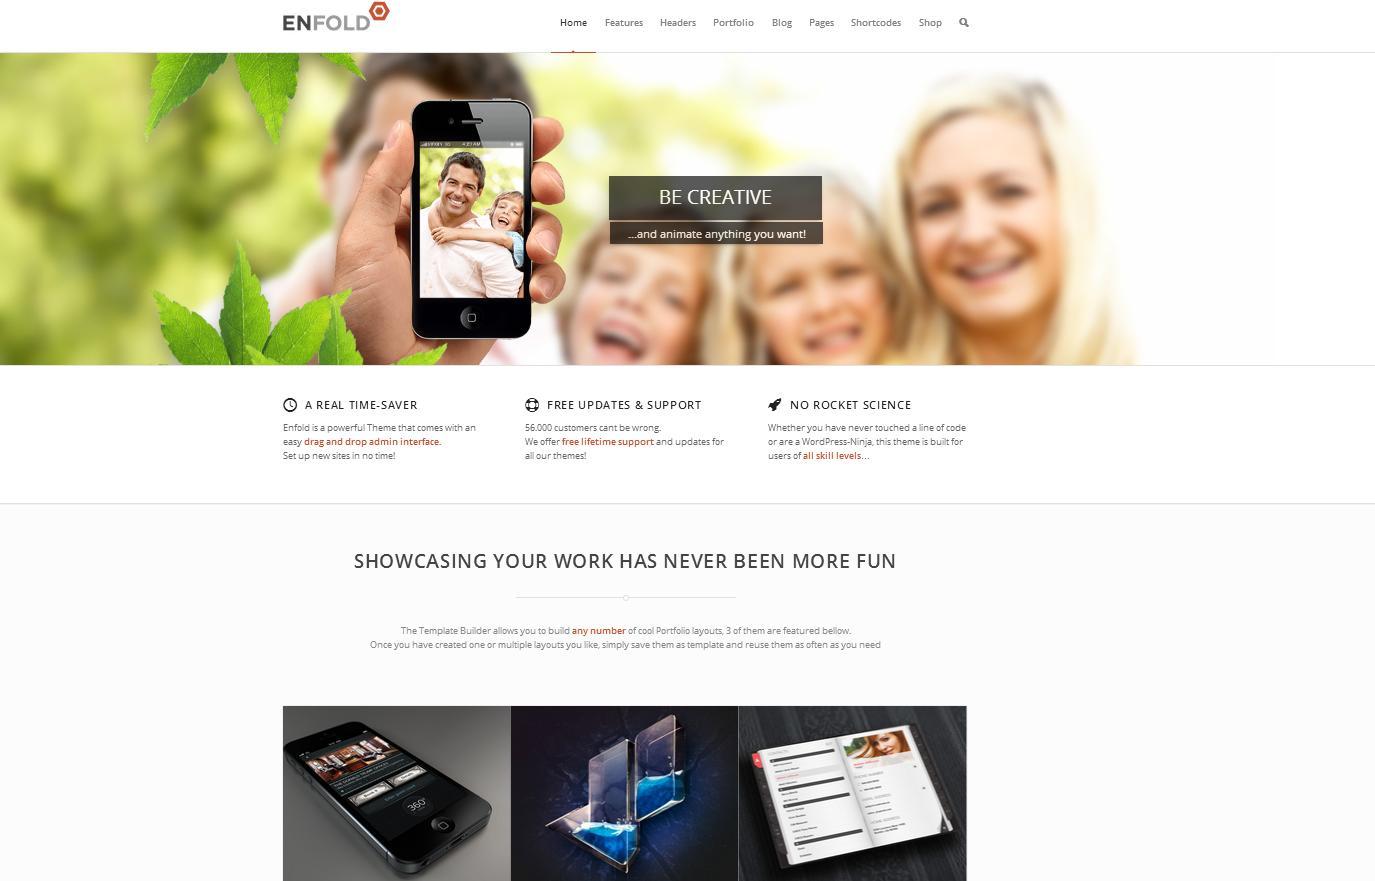 Enfold - Responsive Multi-Purpose Theme - Themes4WP